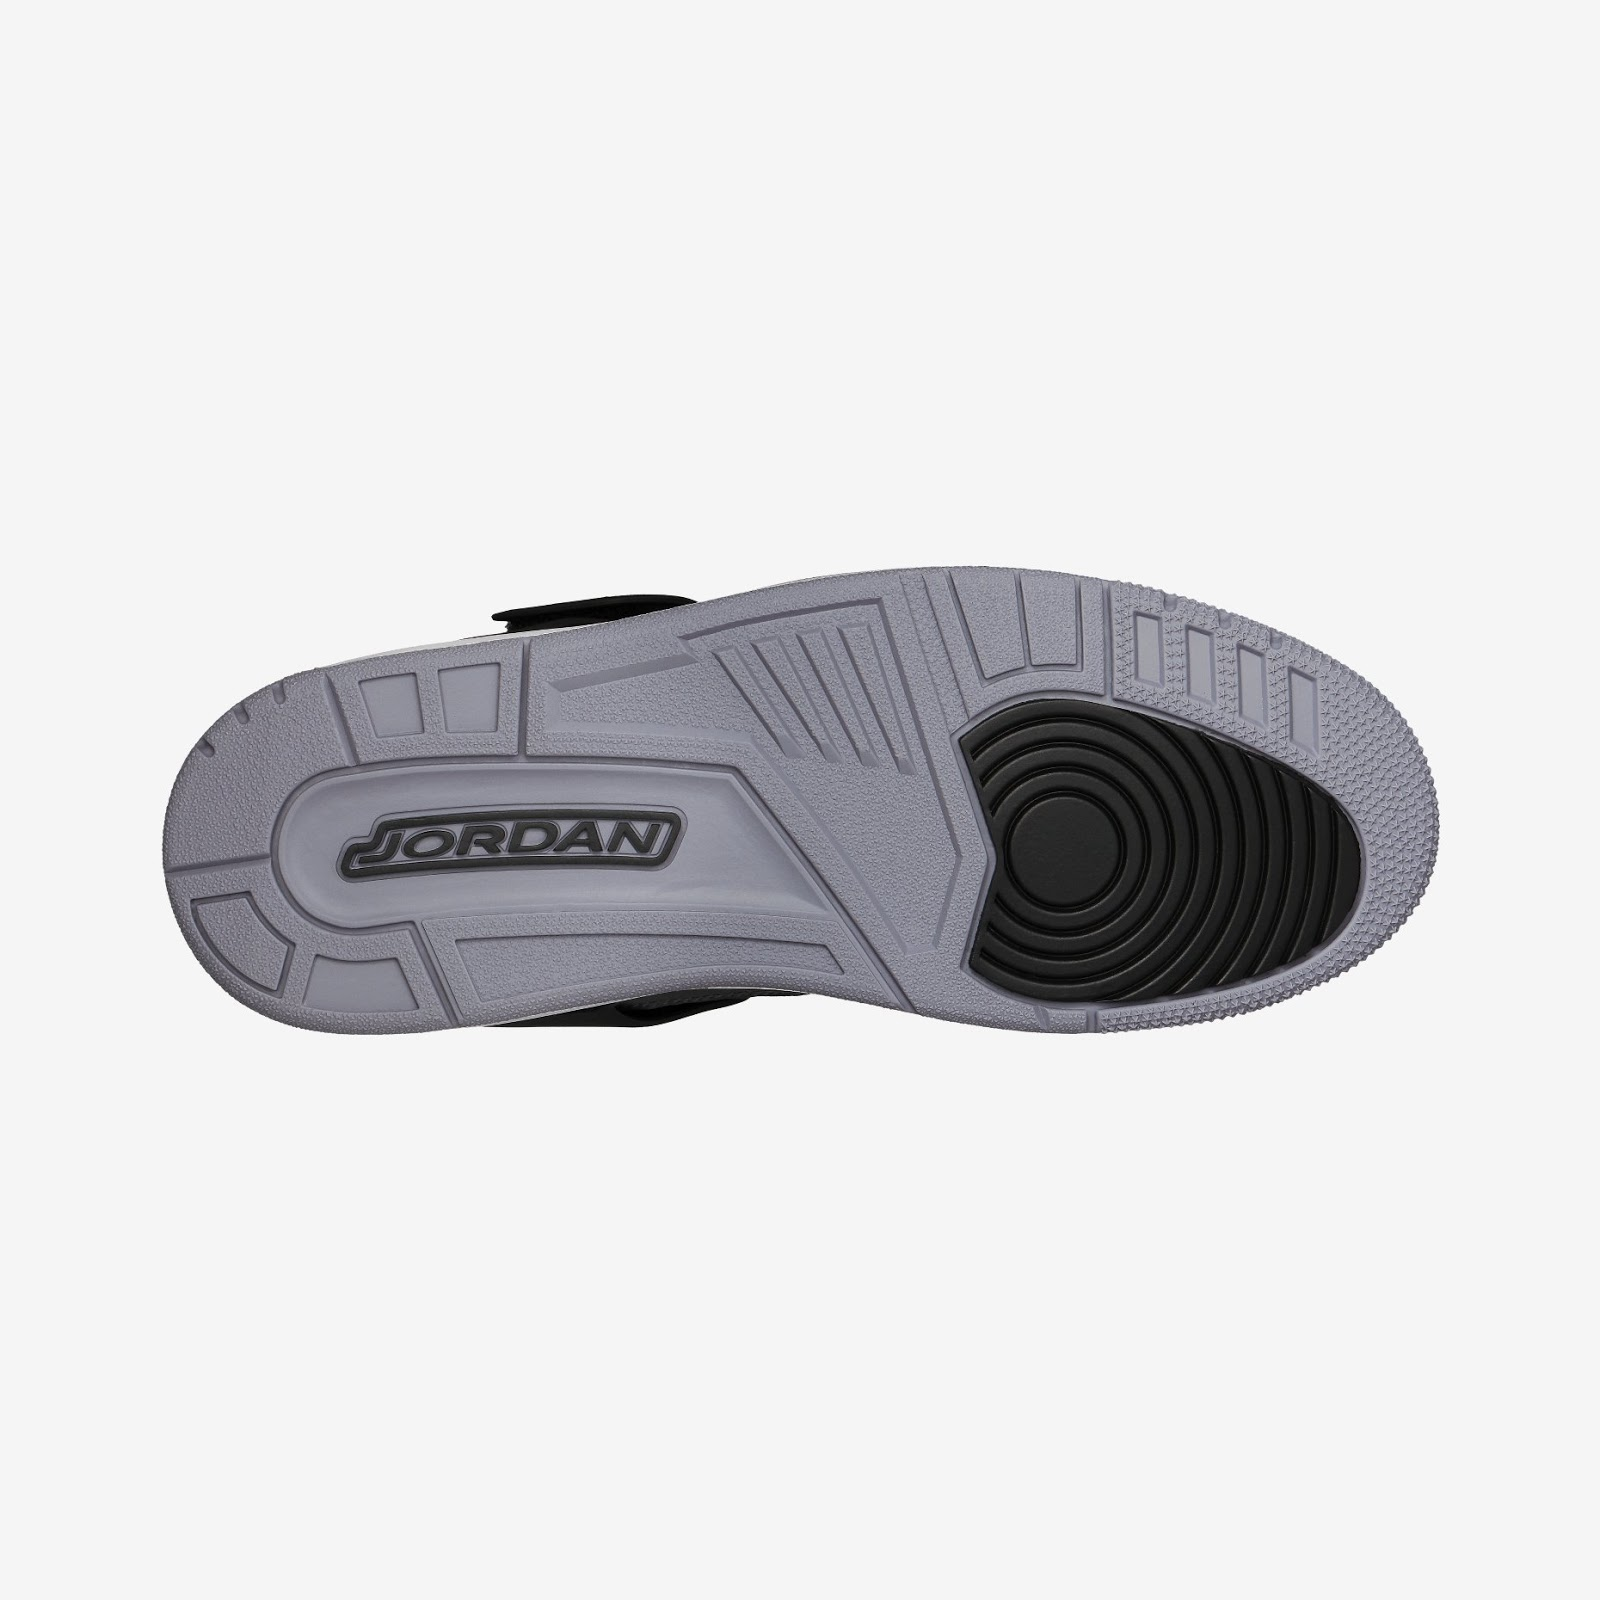 Jordan Basketball SandalsFlight Shoes Retro Nike And Air 7gYbf6vy